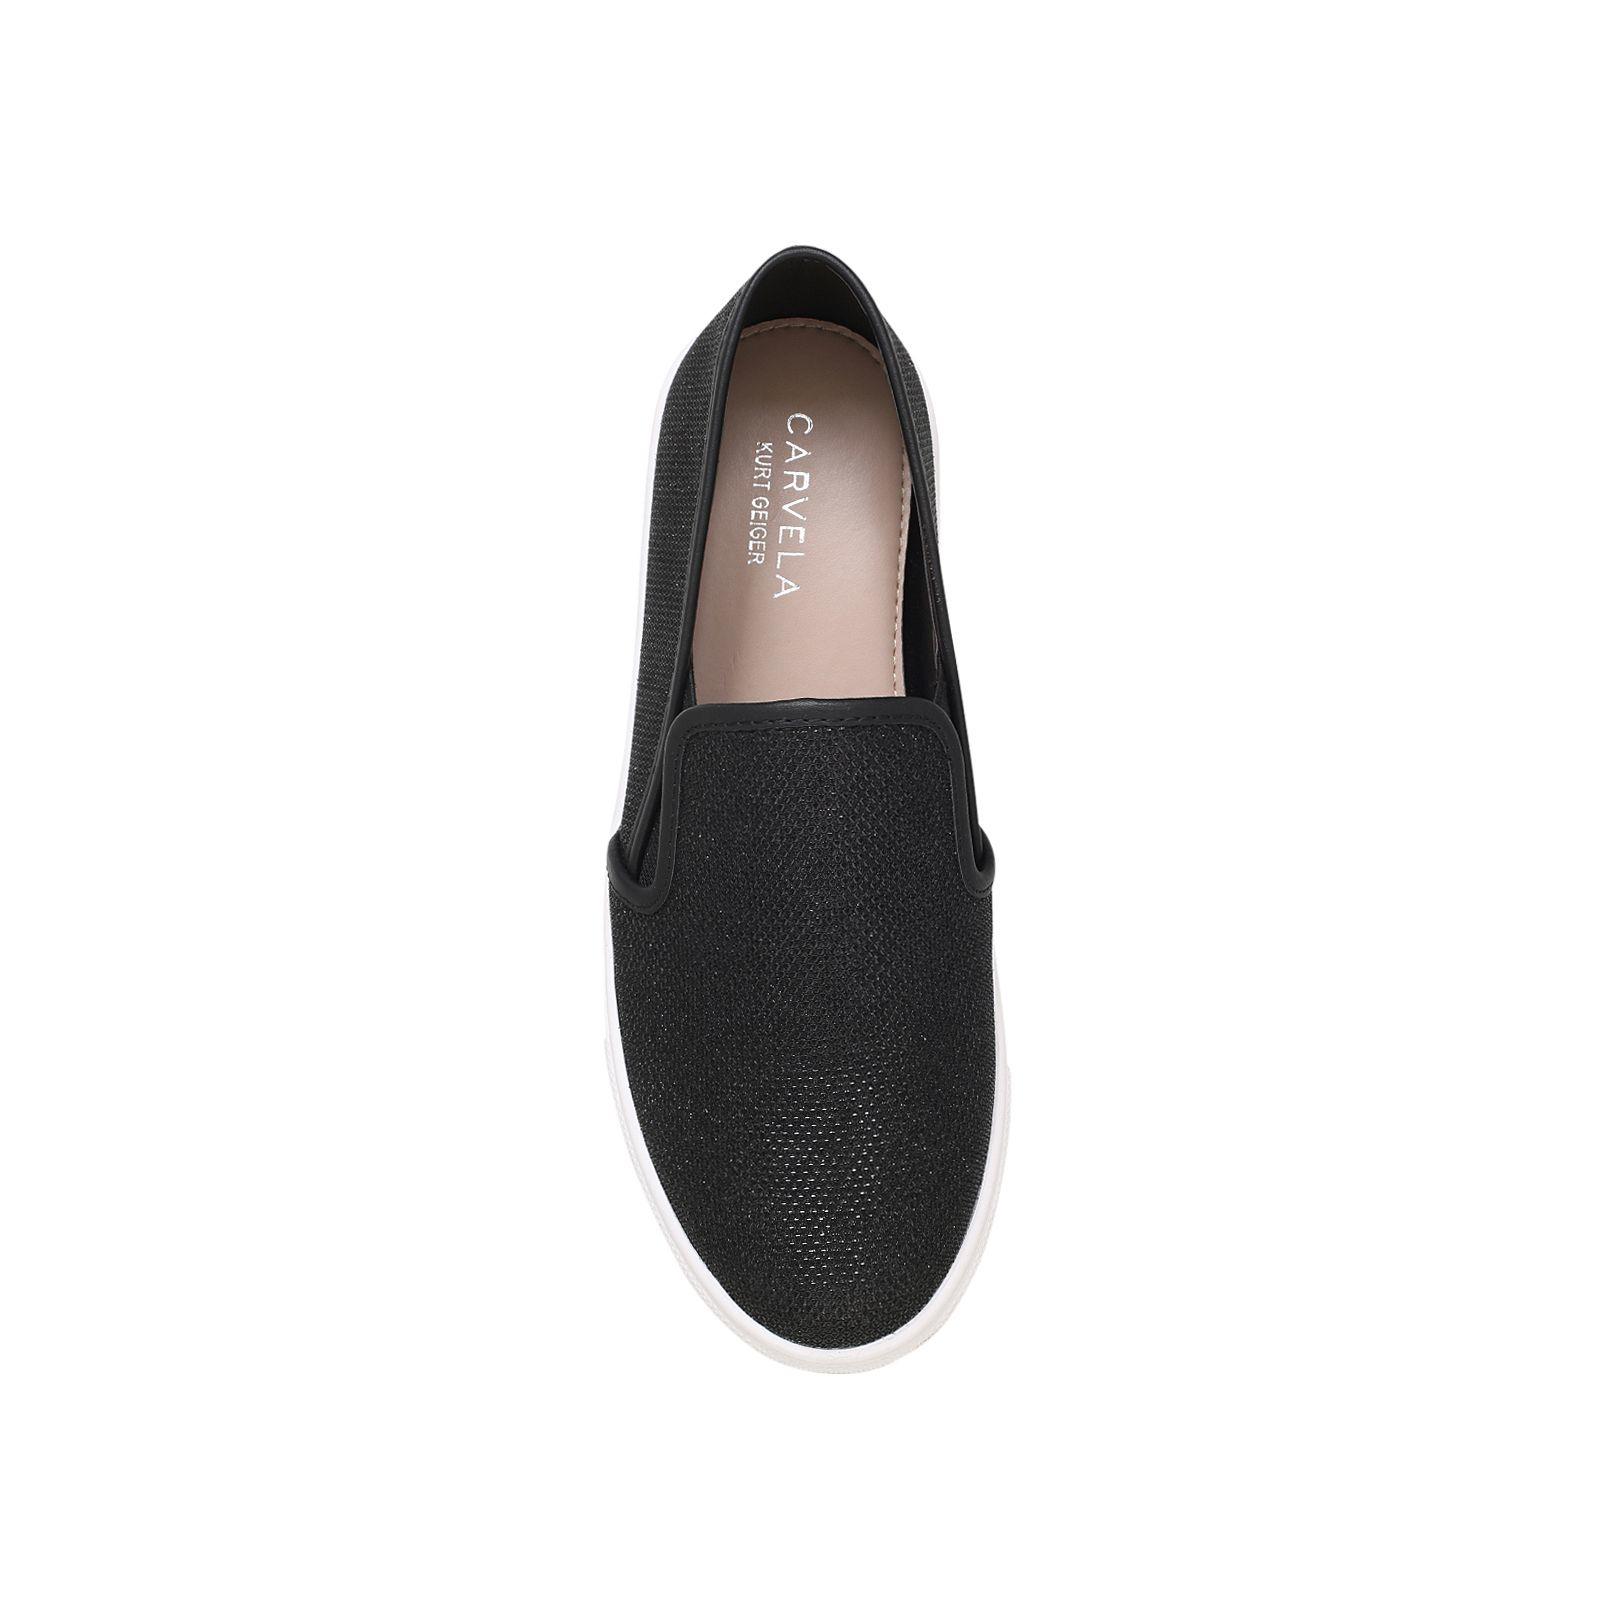 Carvela Kurt Geiger Synthetic Jumo Flat Slip On Sneakers in Black for Men